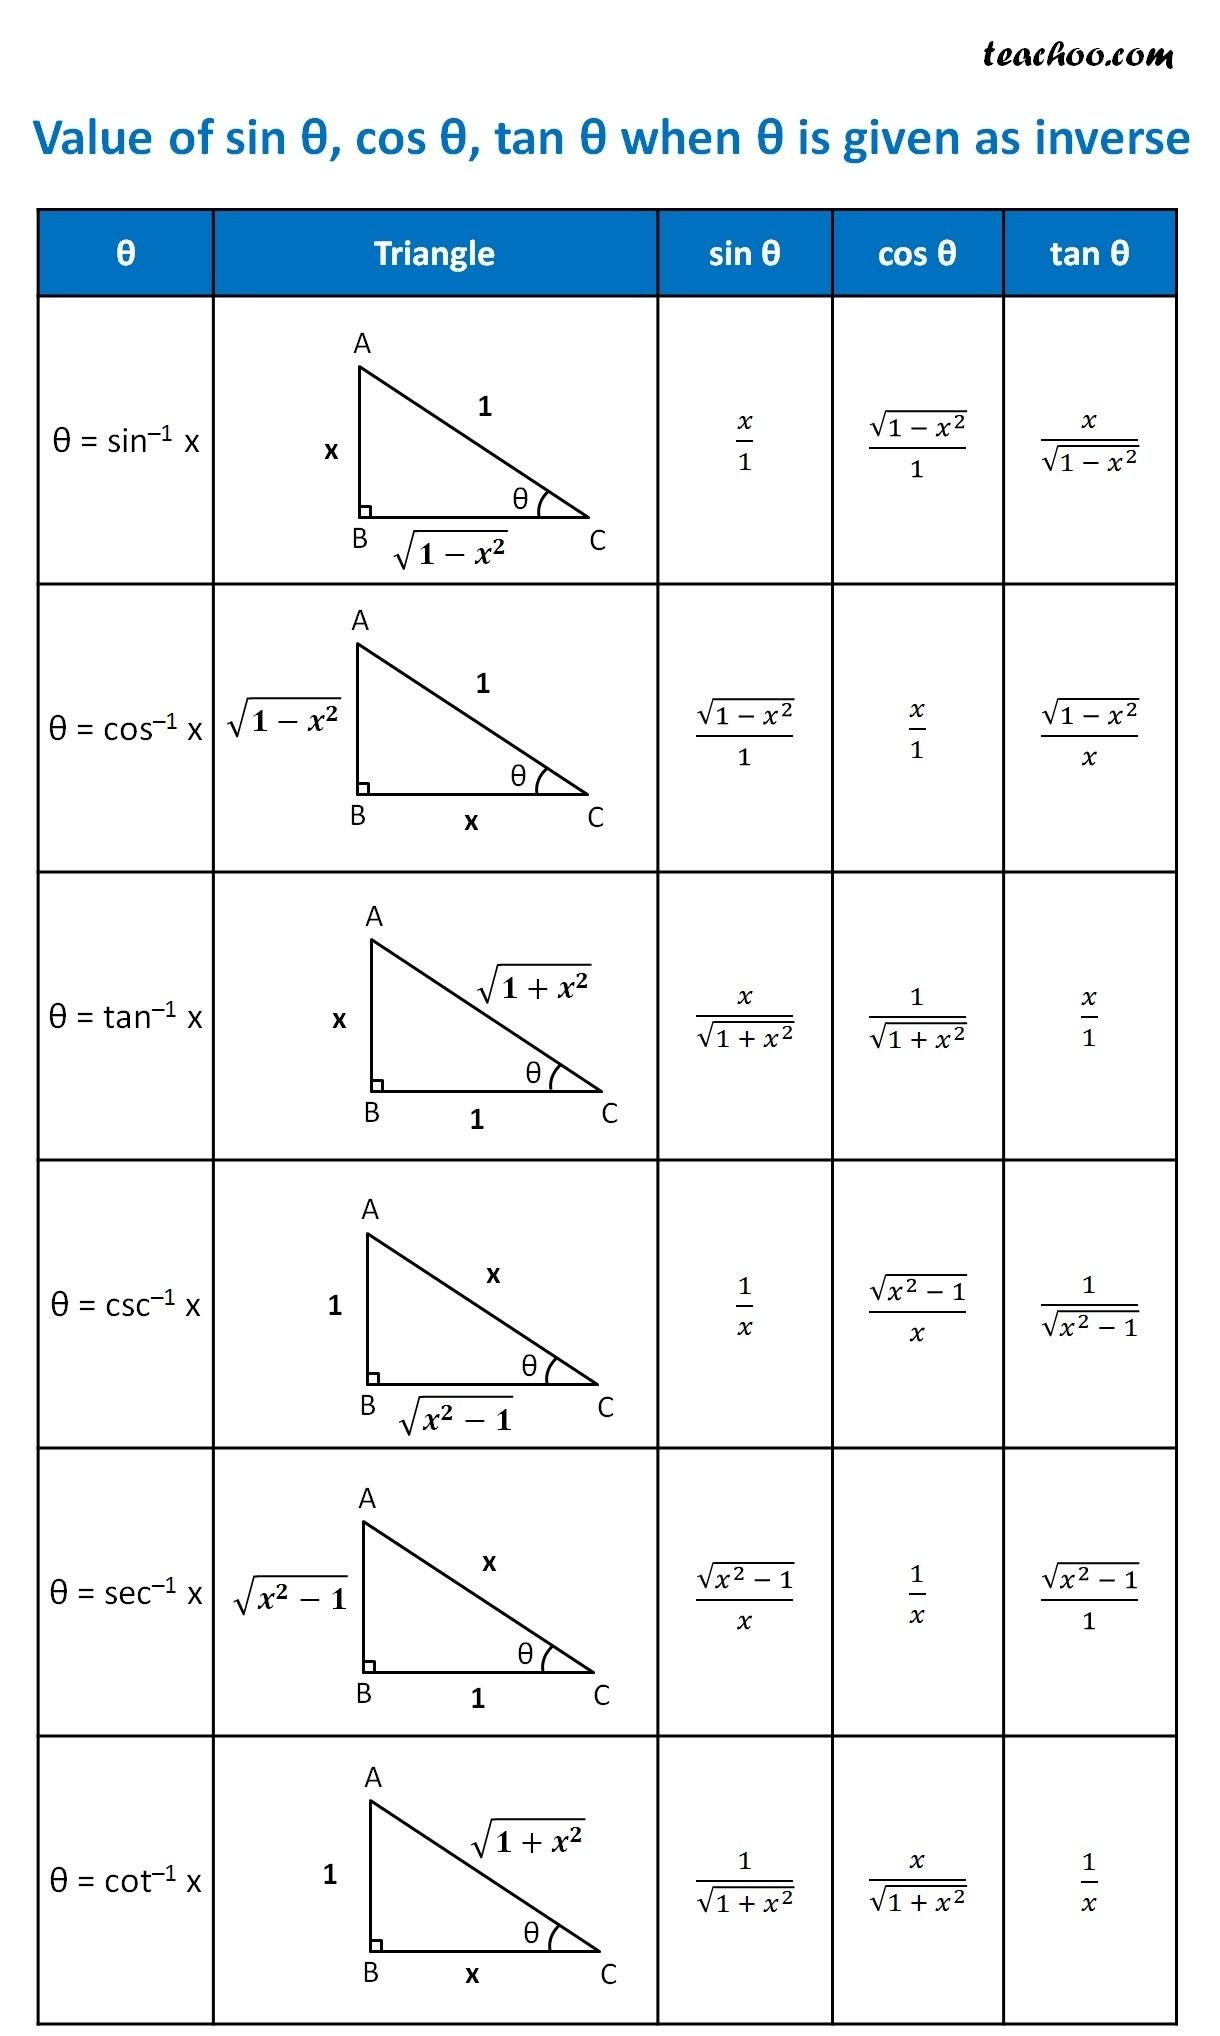 Relation Between Trigonometry Amp Inverse Trigonometry Functions